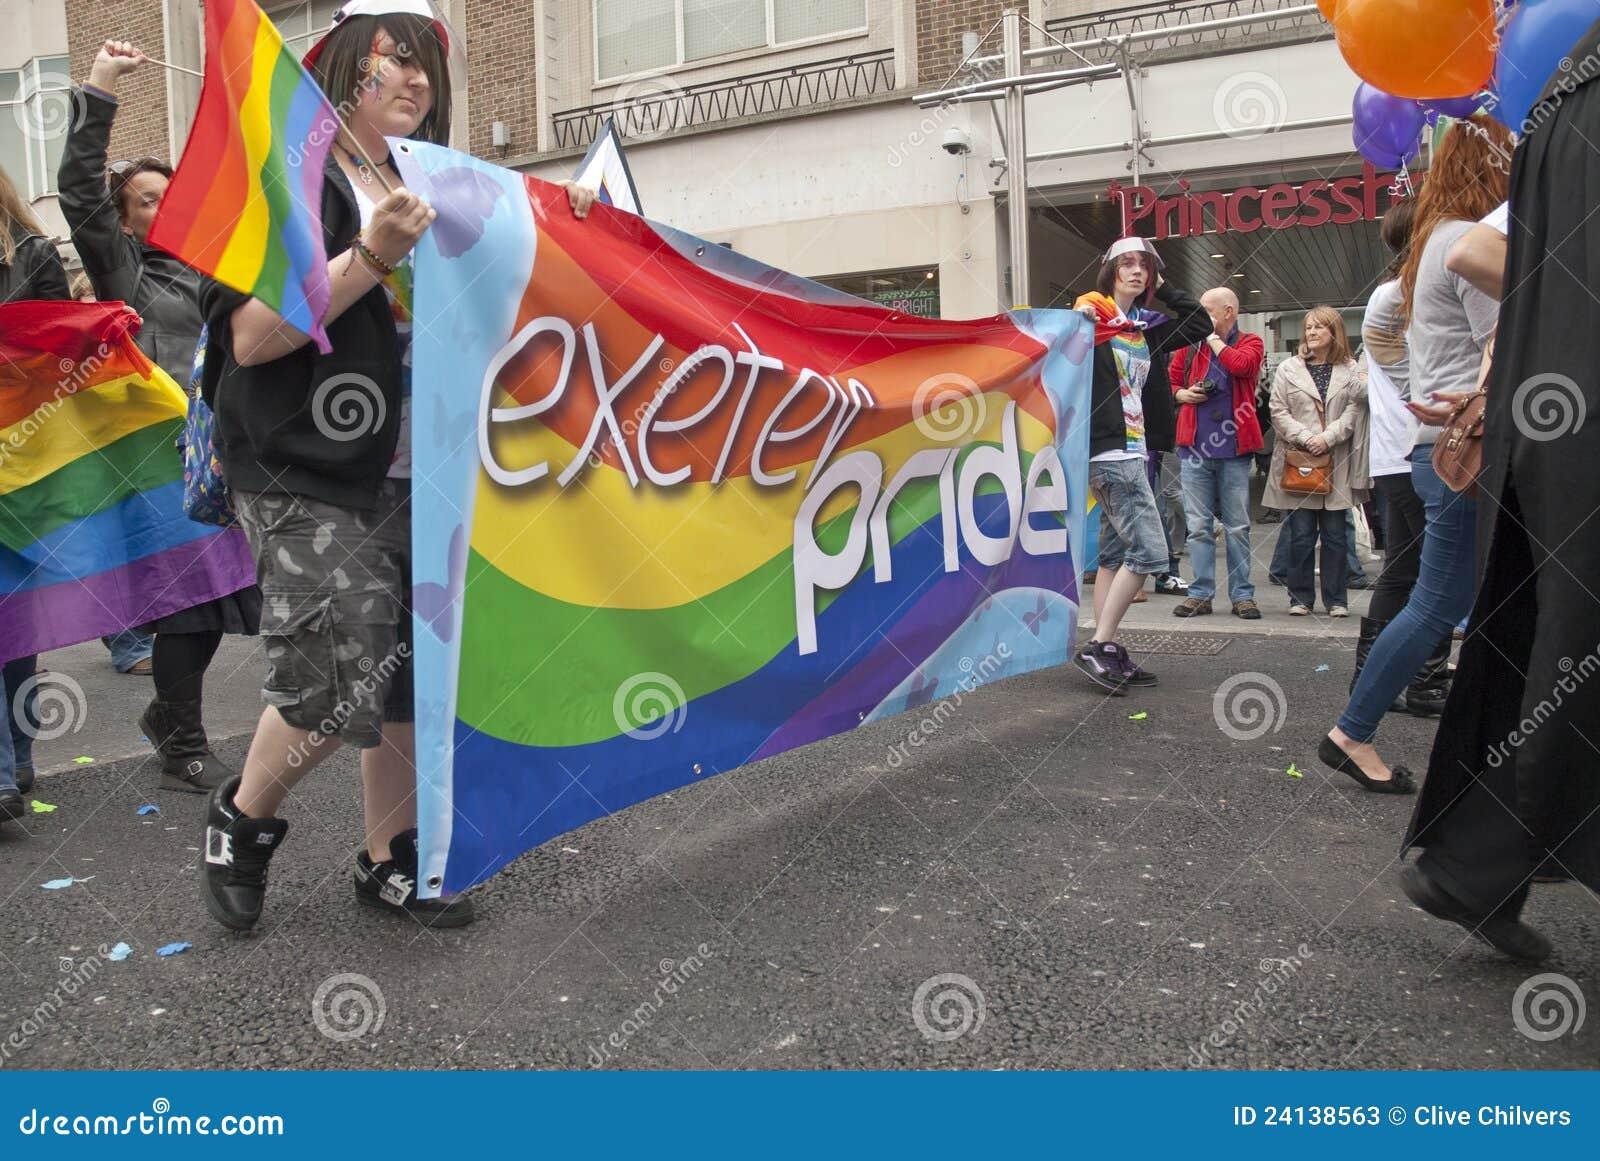 glastonbury lesbian personals Single lesbian women in annapolis junction free online dating & chat in   stewartsville spanish girl personals east glastonbury muslim single women.